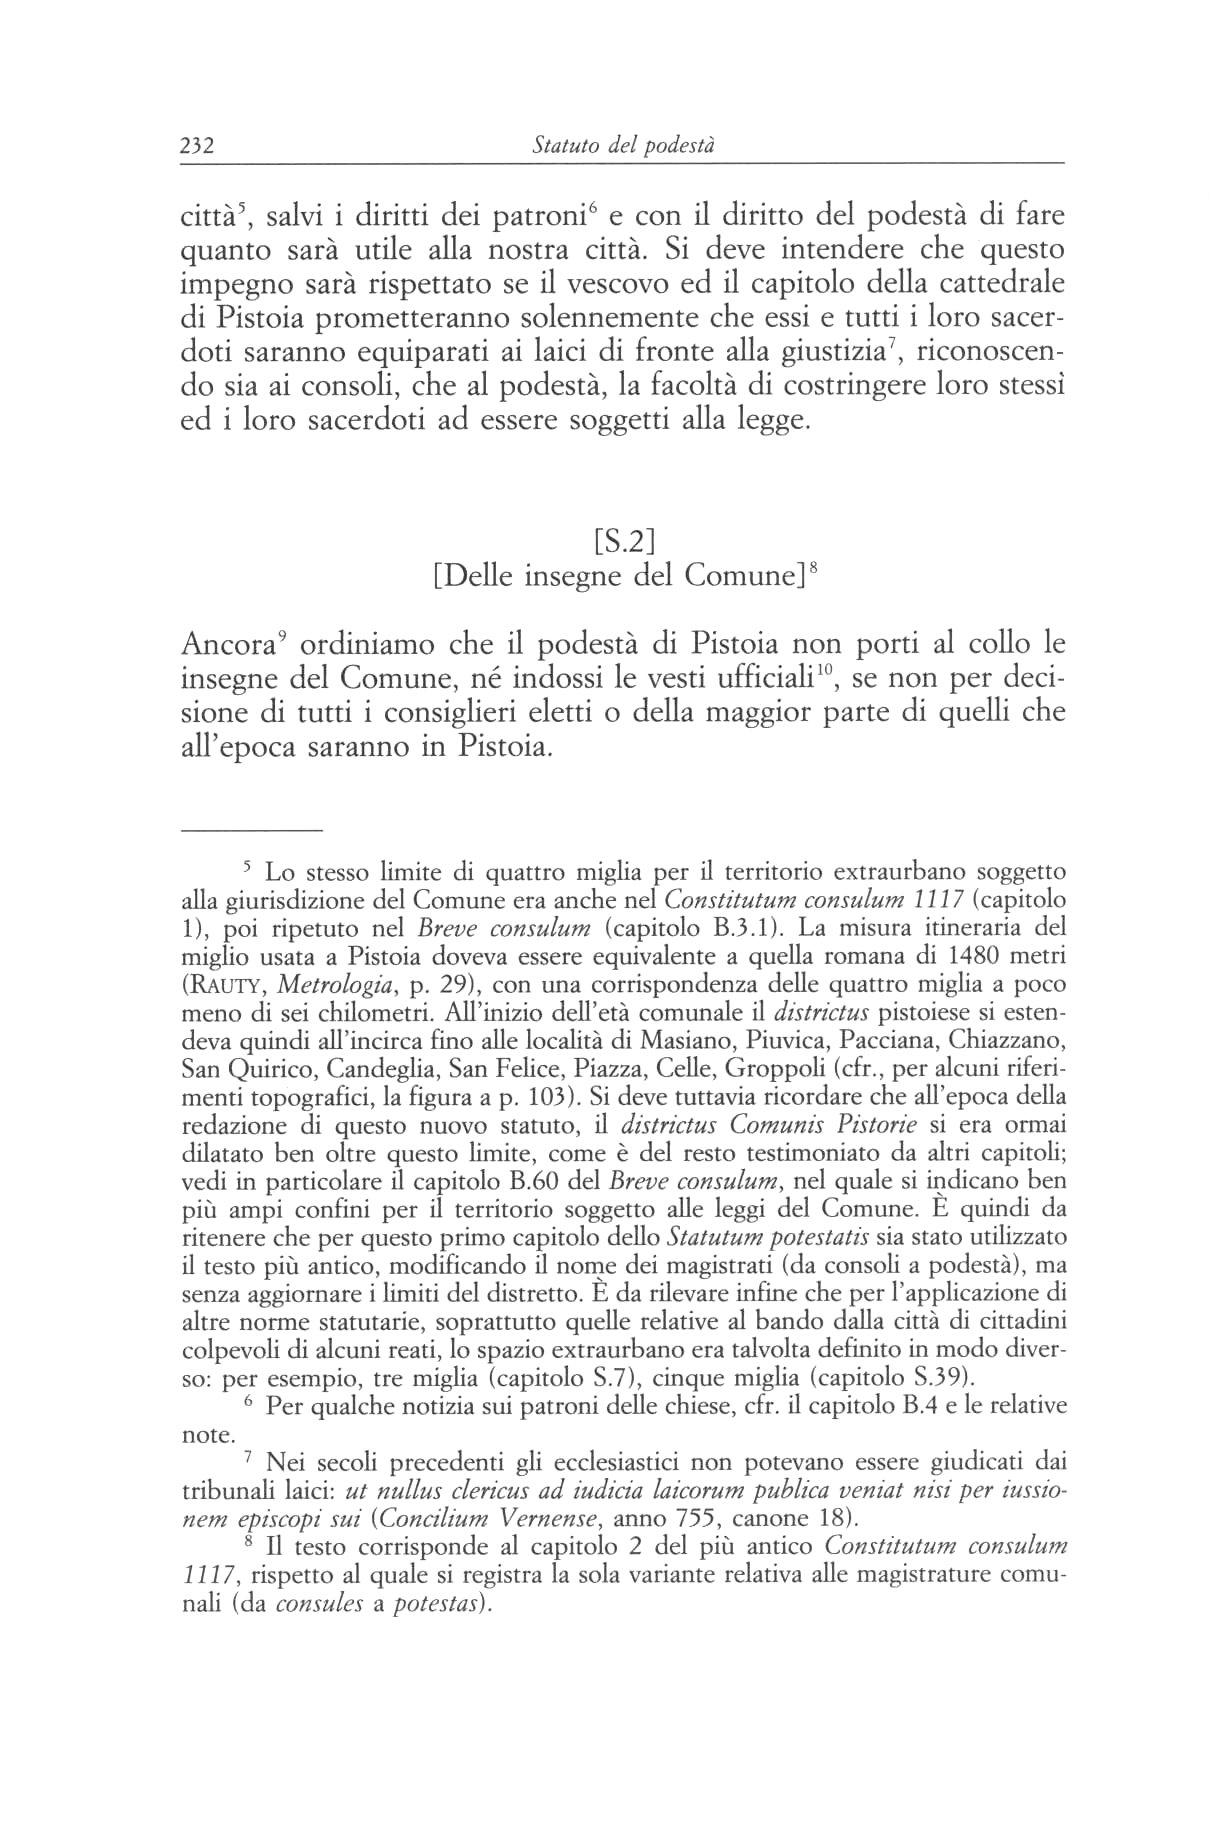 statuti pistoiesi del sec.XII 0232.jpg